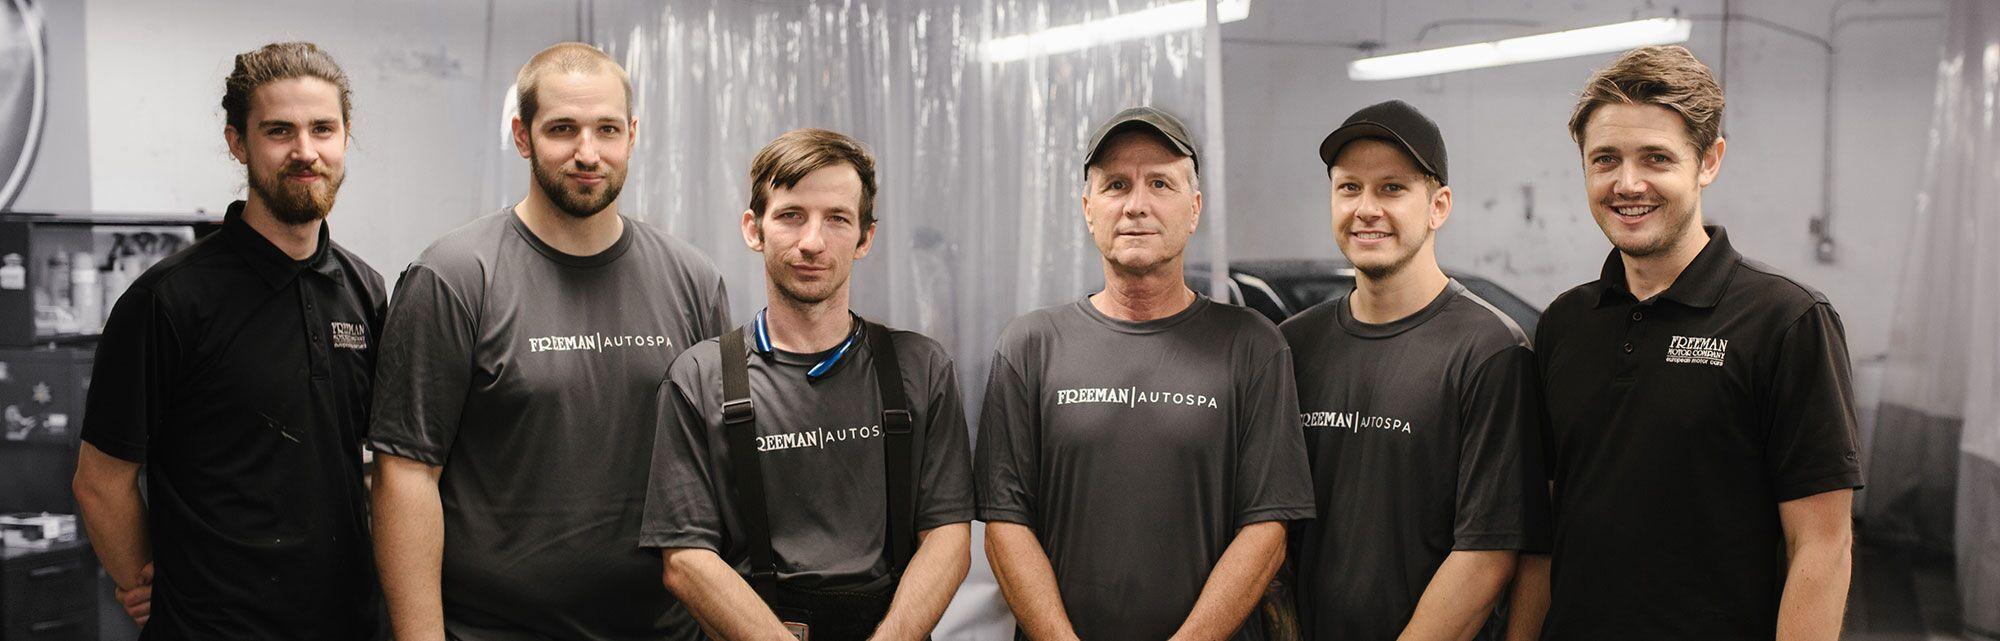 Autospa Team